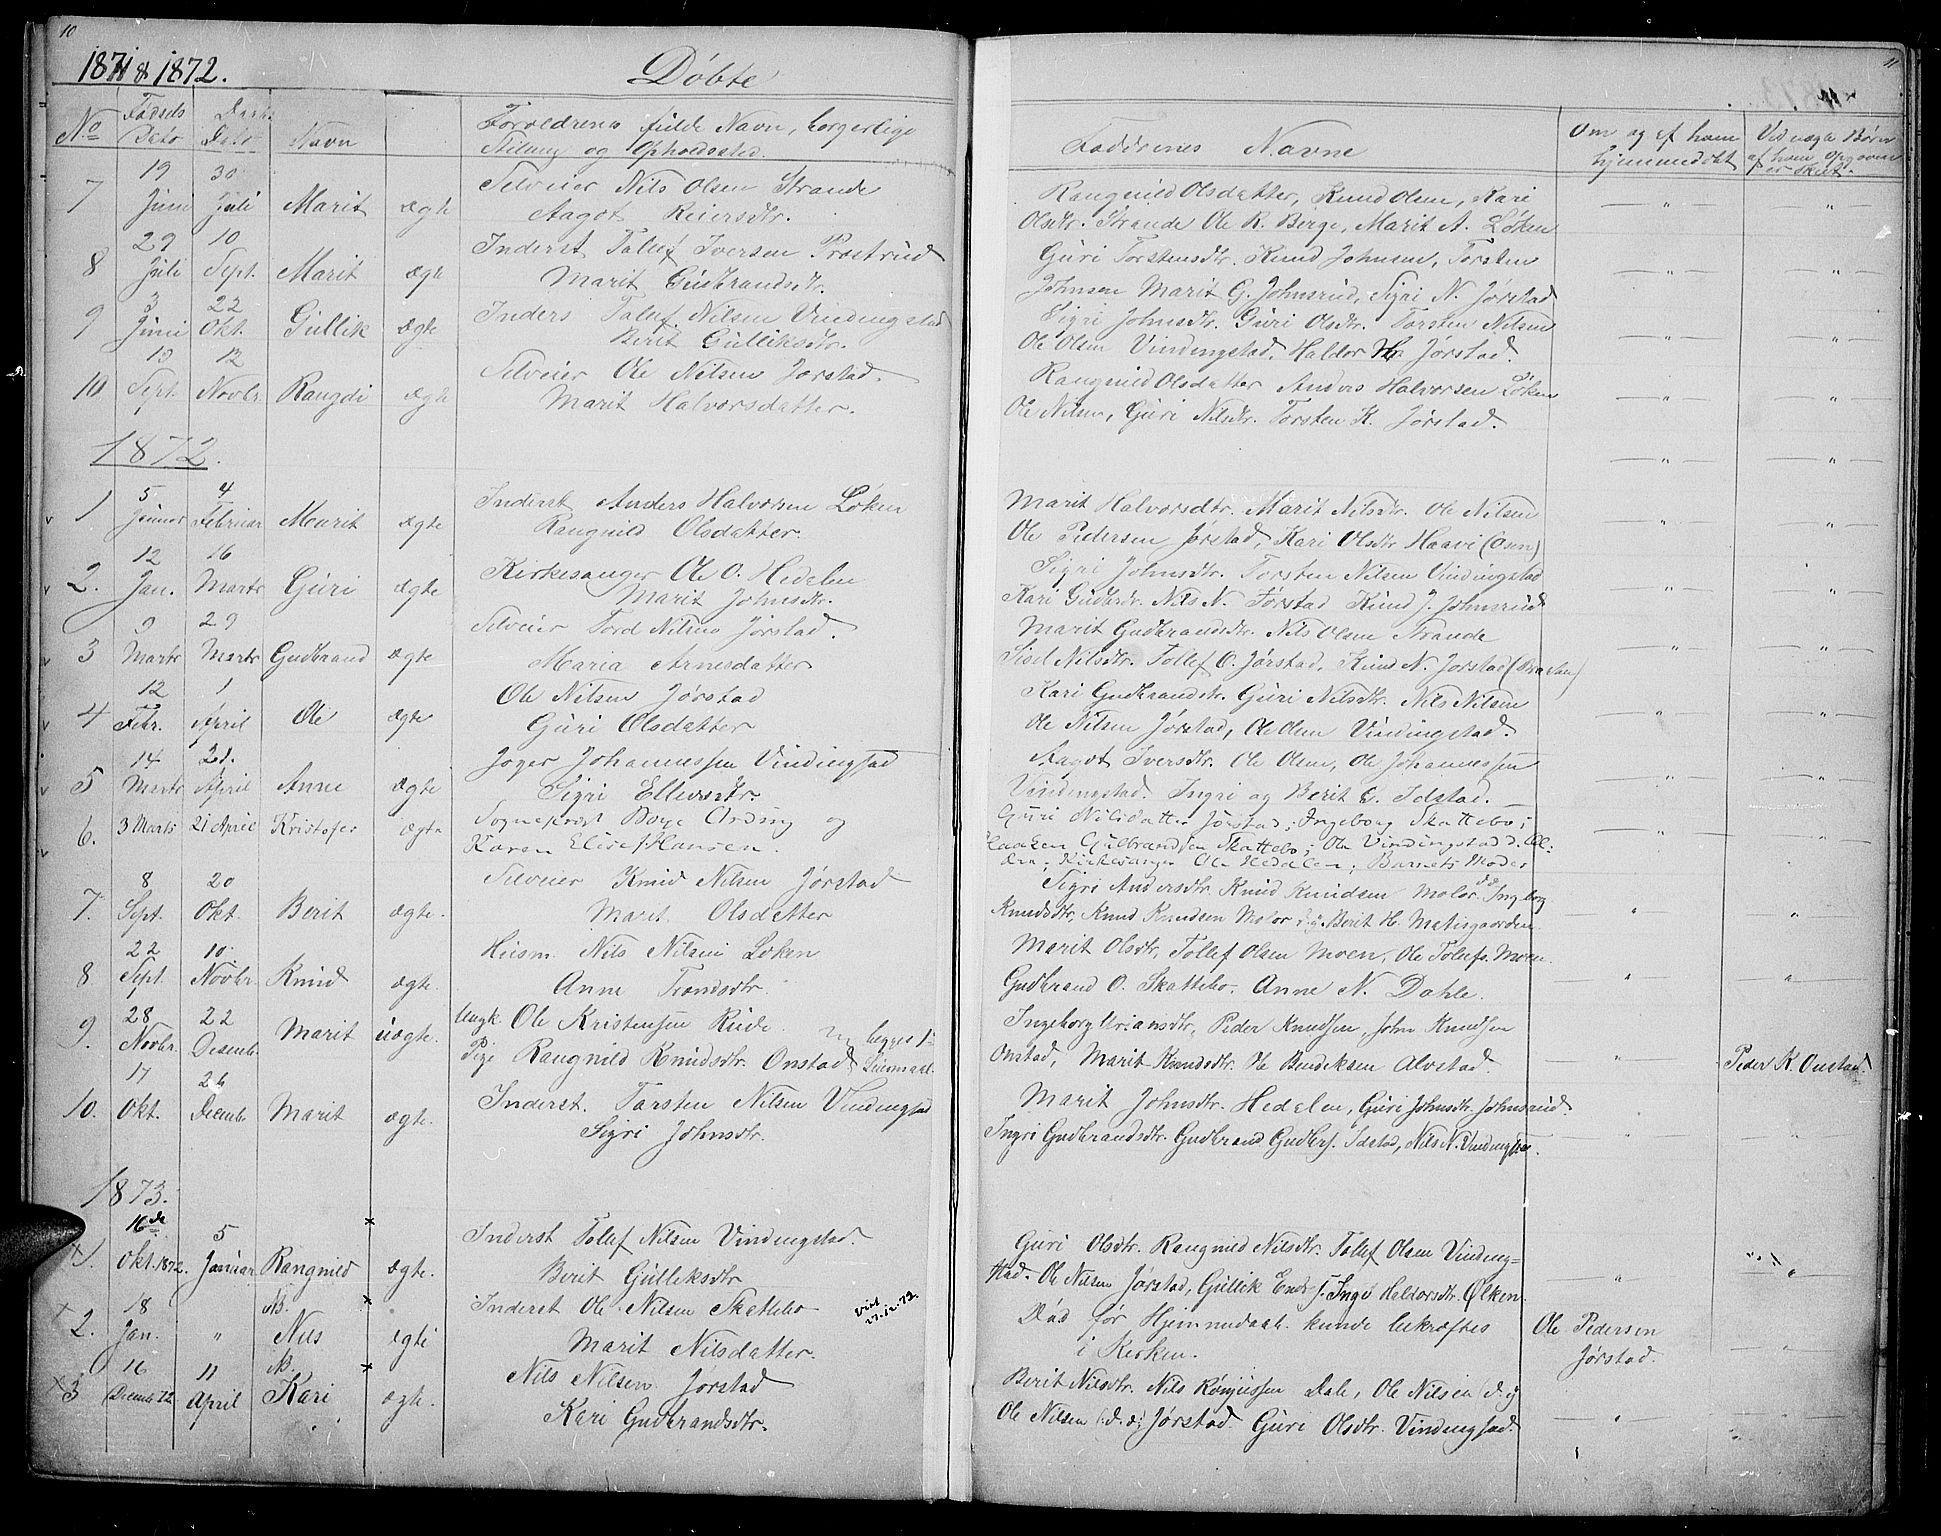 SAH, Øystre Slidre prestekontor, Klokkerbok nr. 2, 1866-1886, s. 10-11